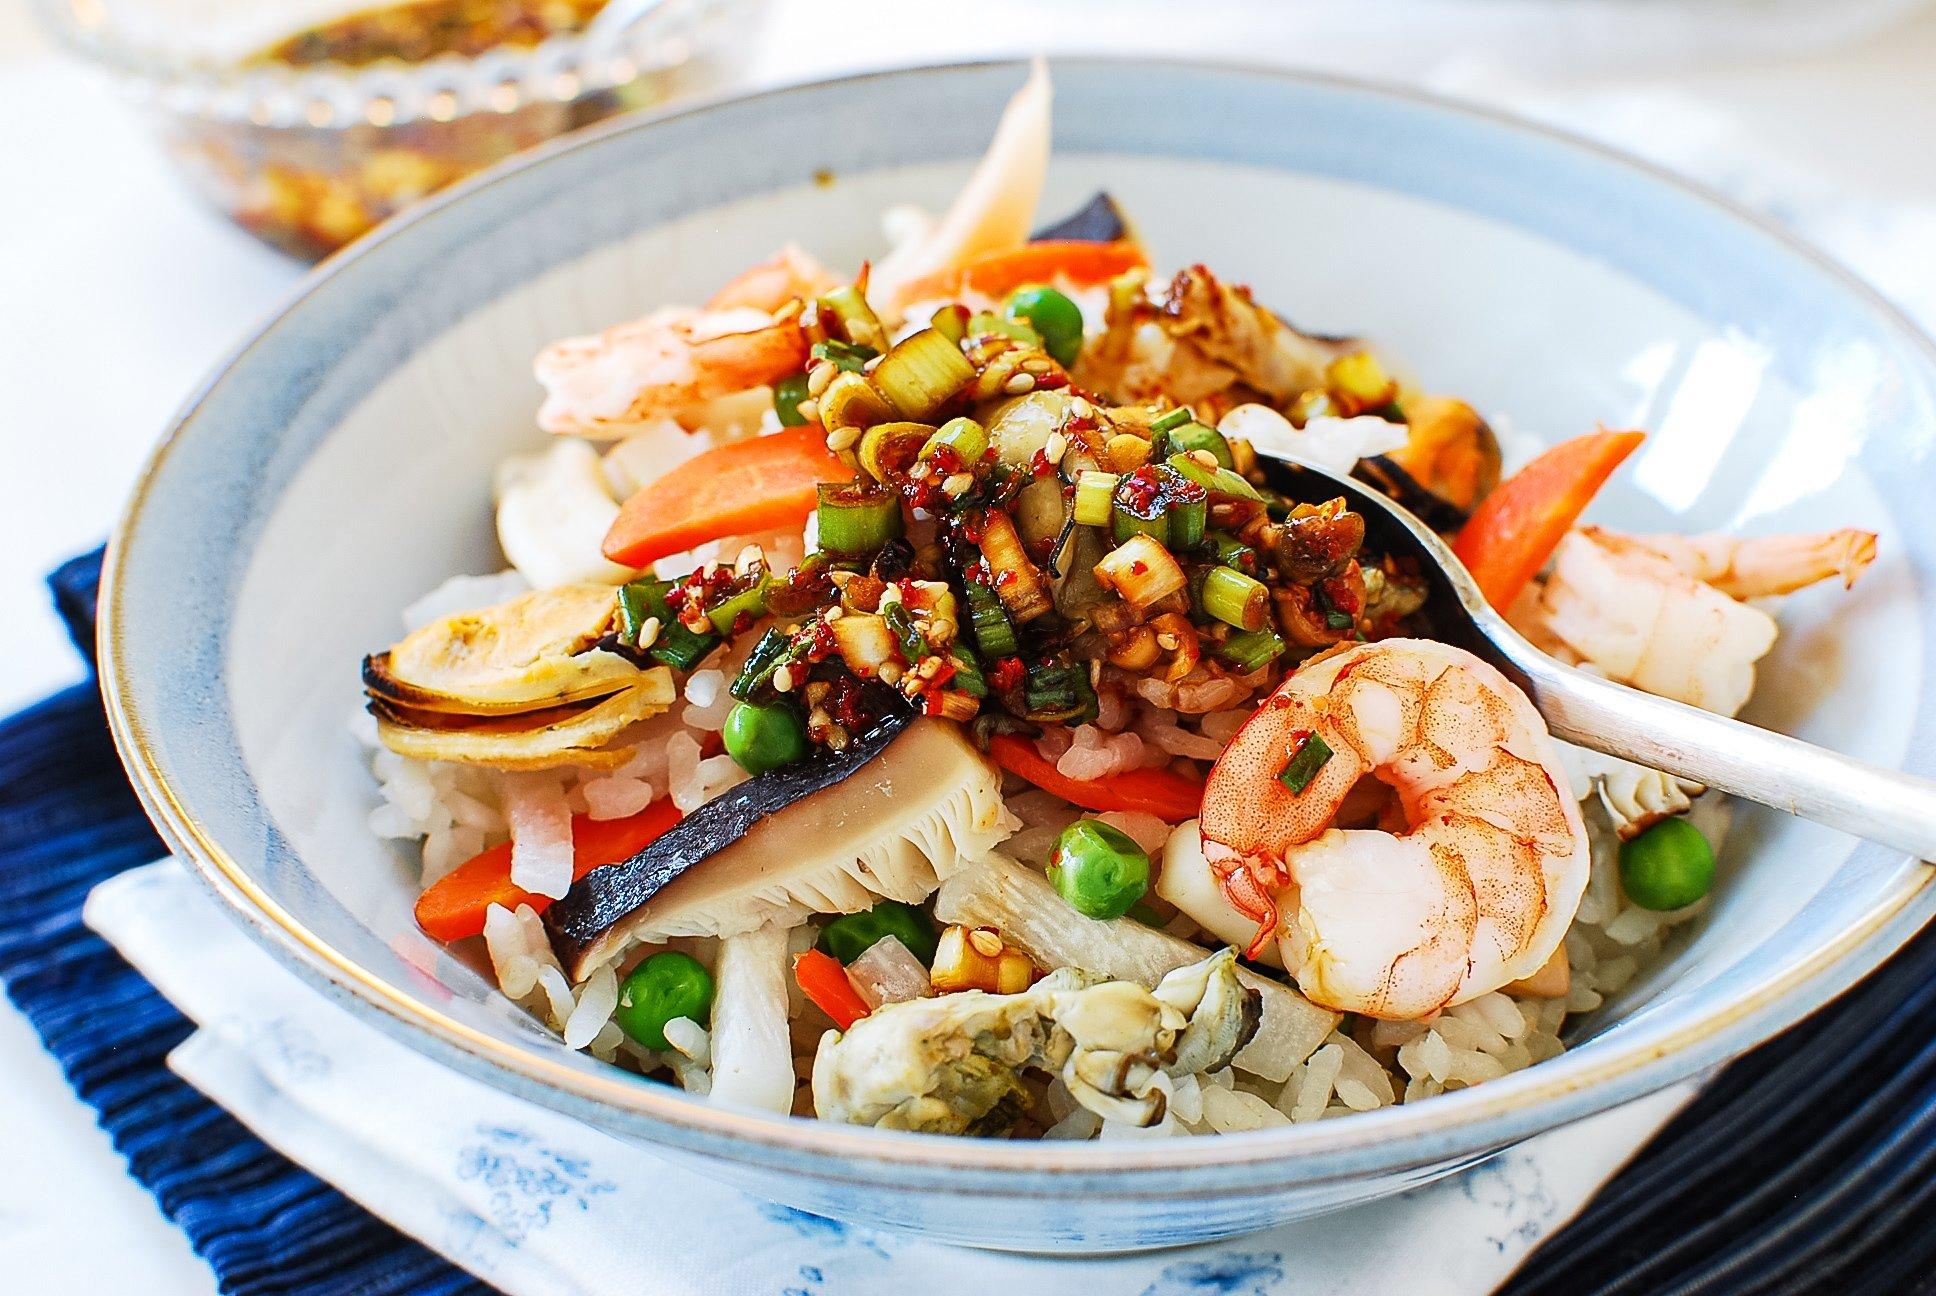 DSC 4156 3 - Haemul Bap (Seafood Rice Bowl)